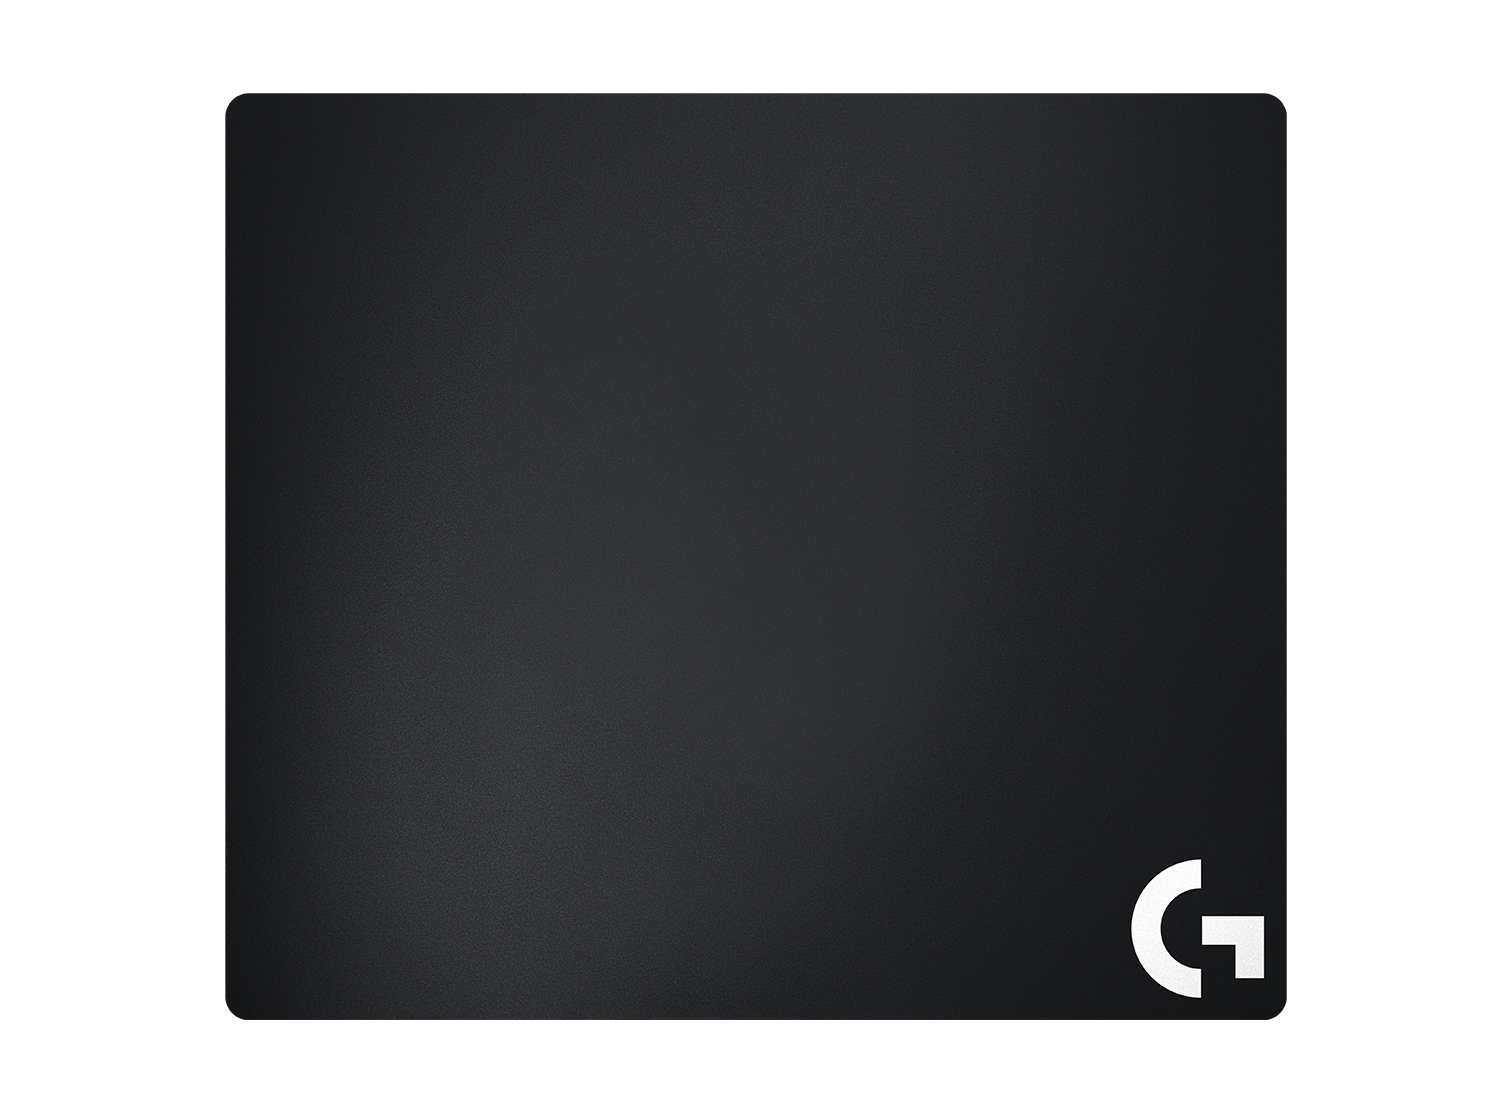 PAD EXTENDIDO GRANDE G640 - LOGI